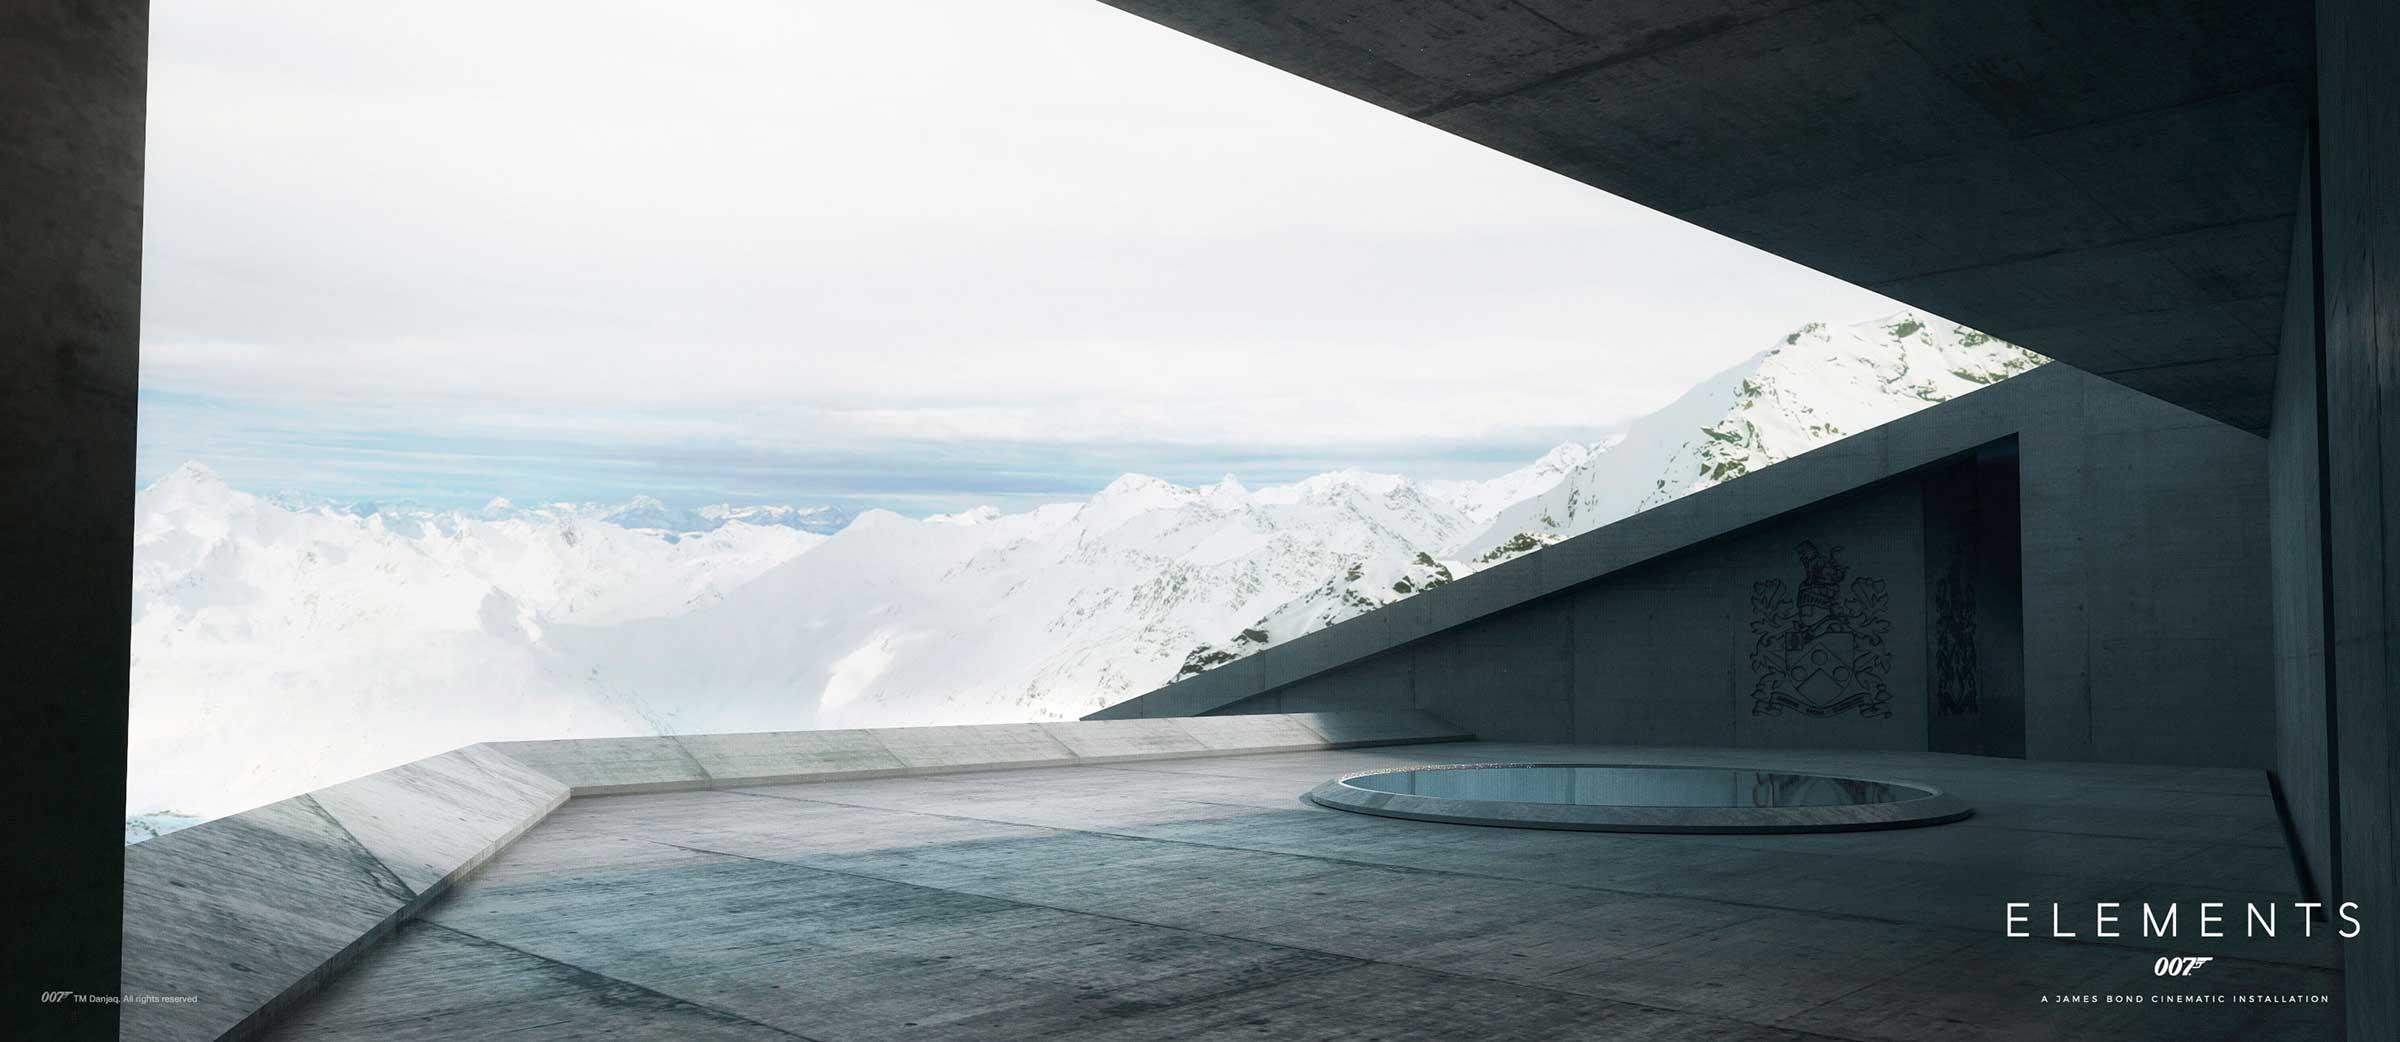 007 Elements Rendering mit James Bond Familienwappen - 007 Elements Sölden